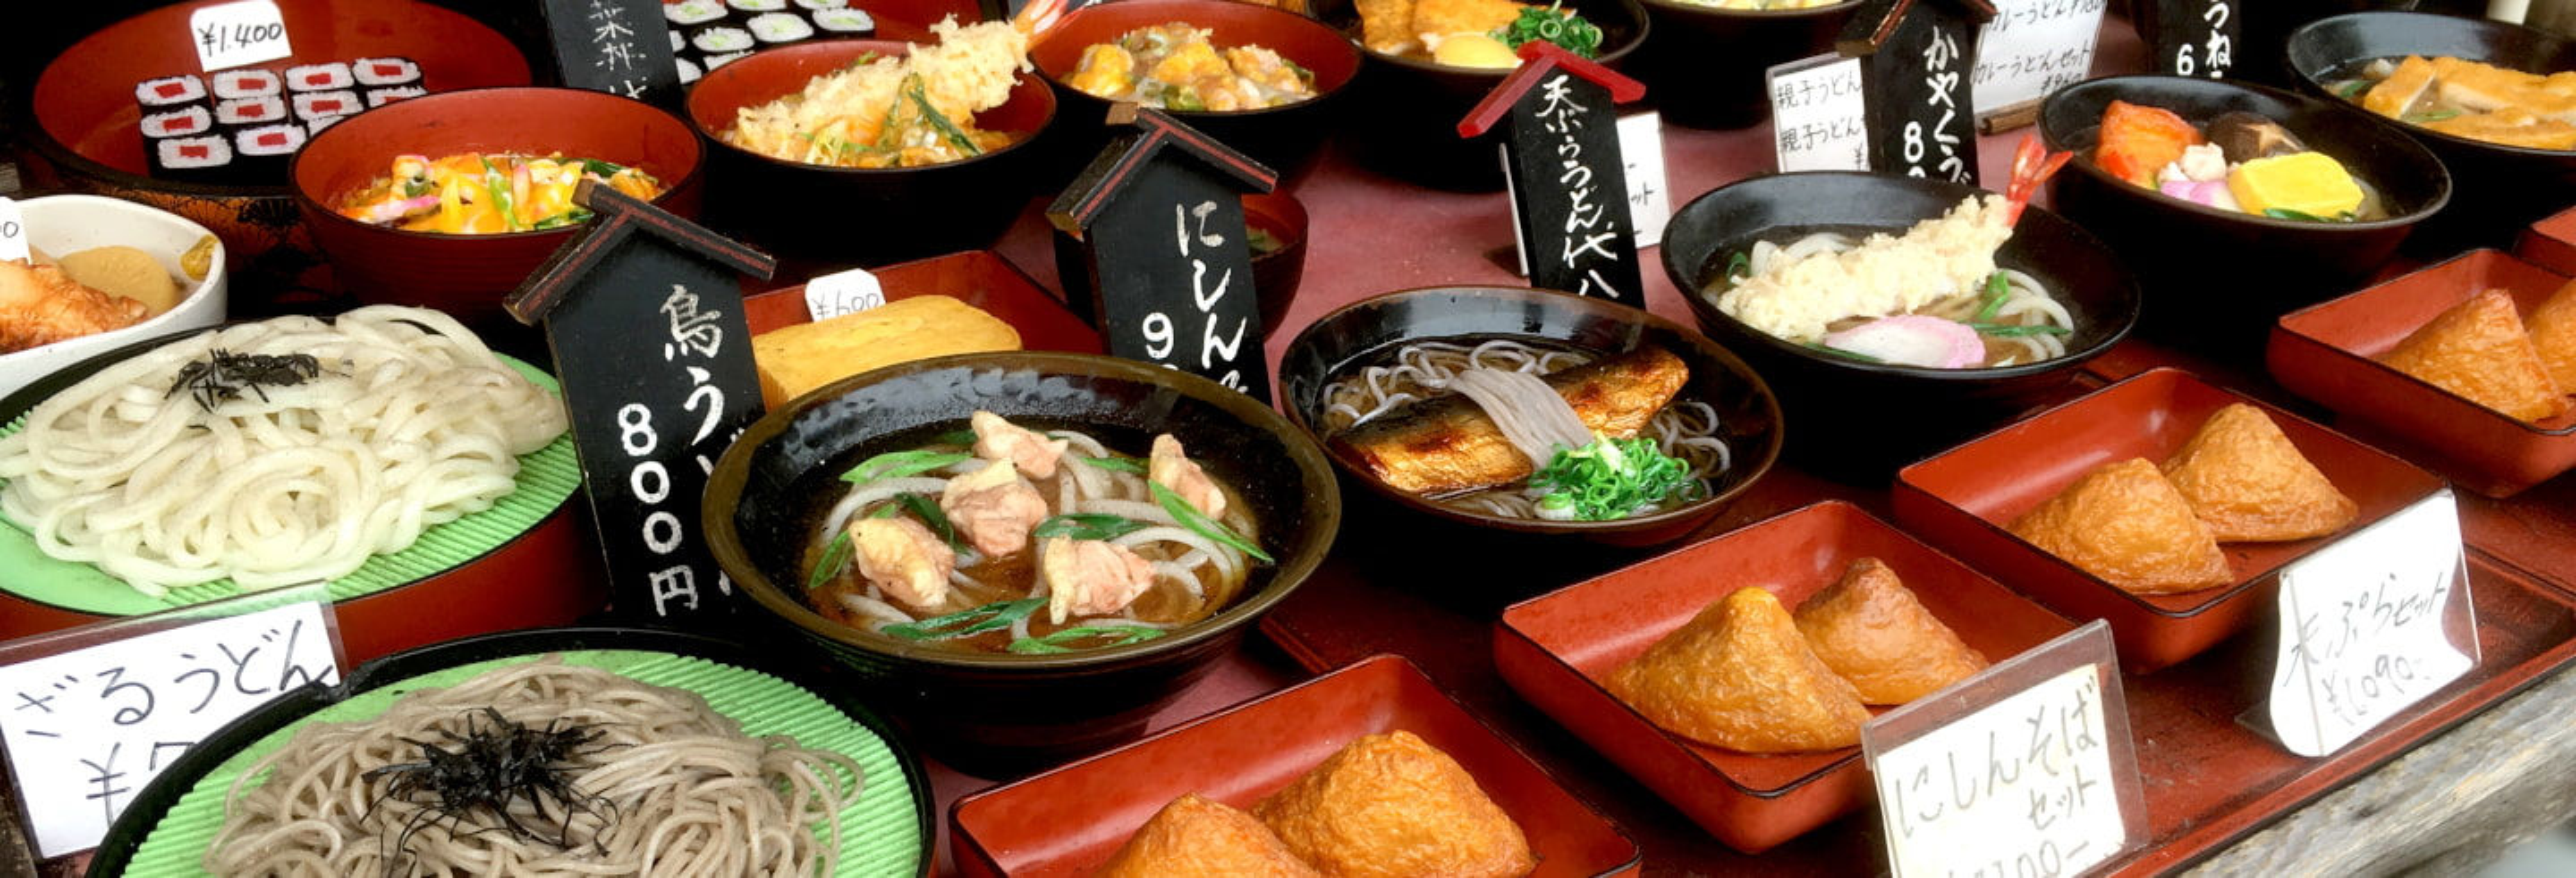 Tour gastronômico por Kyoto